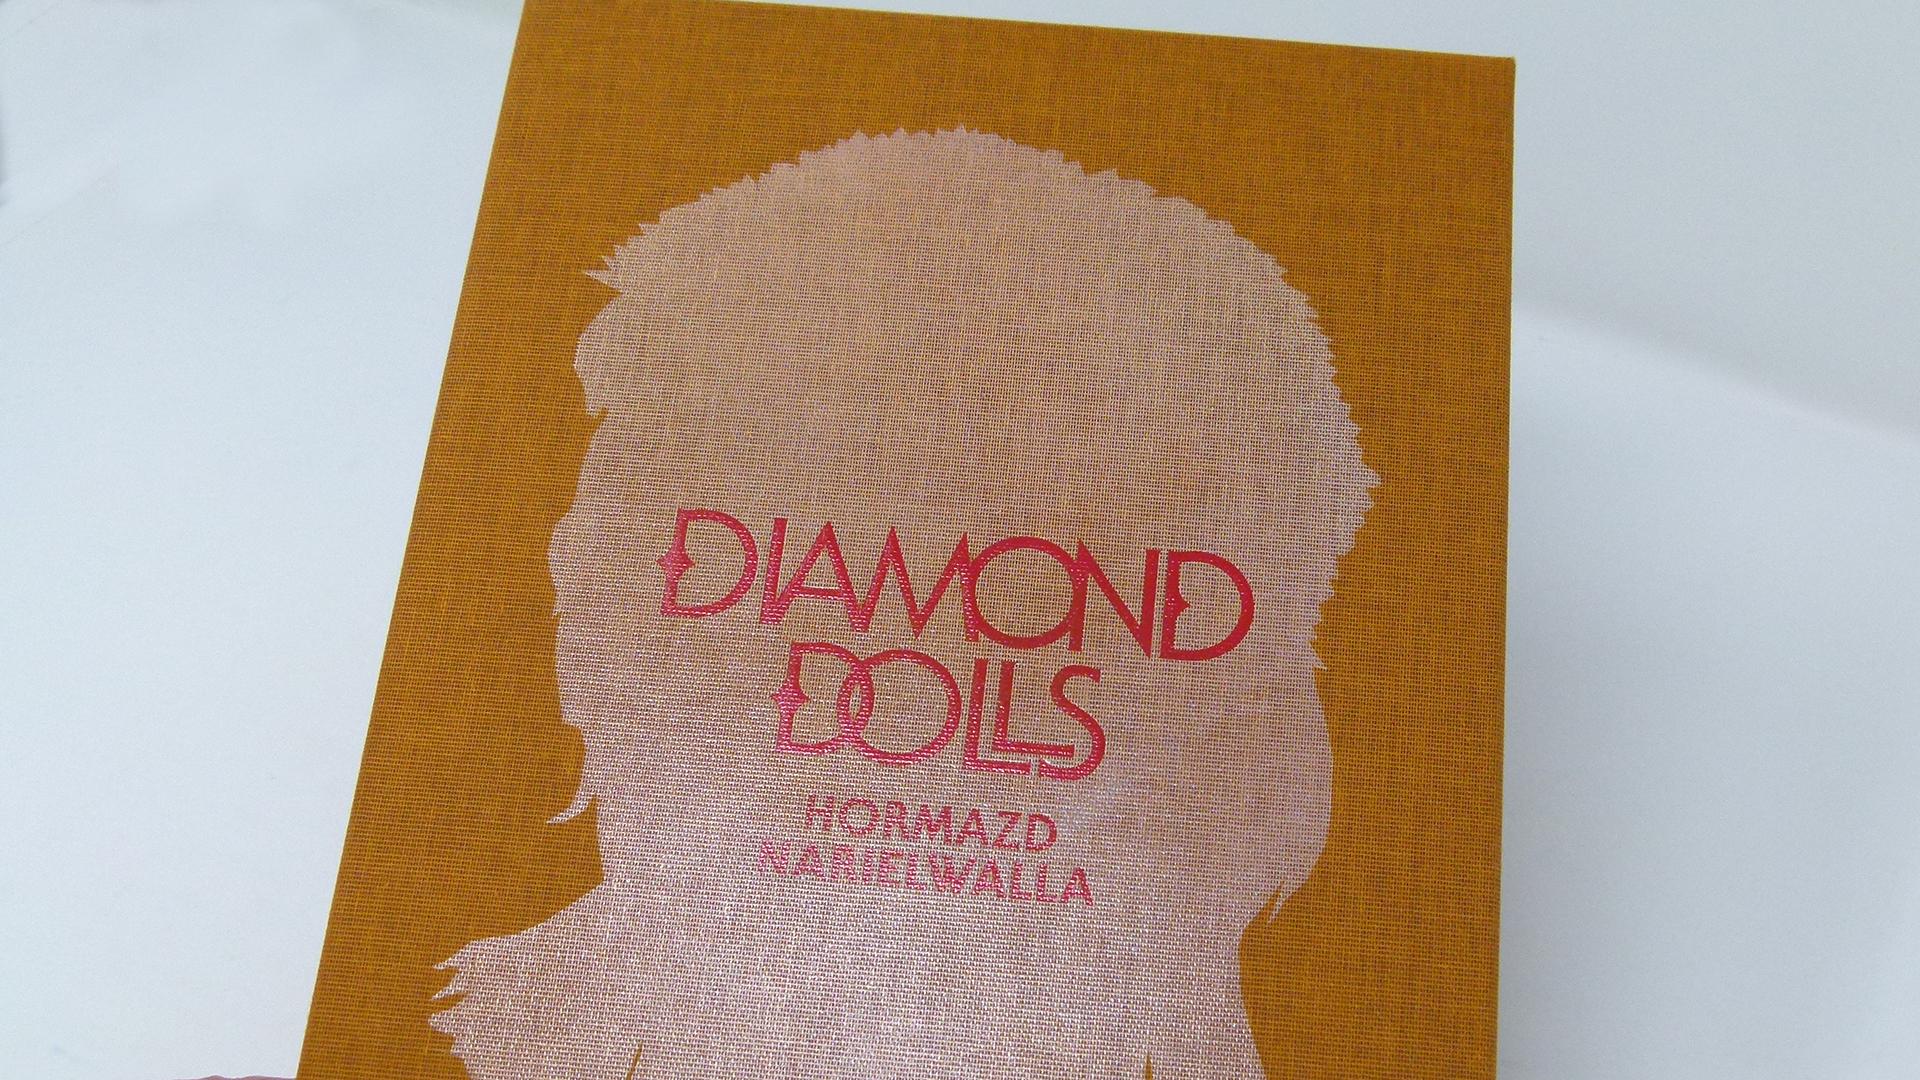 David Bowie Themed 'Diamond Dolls' Book